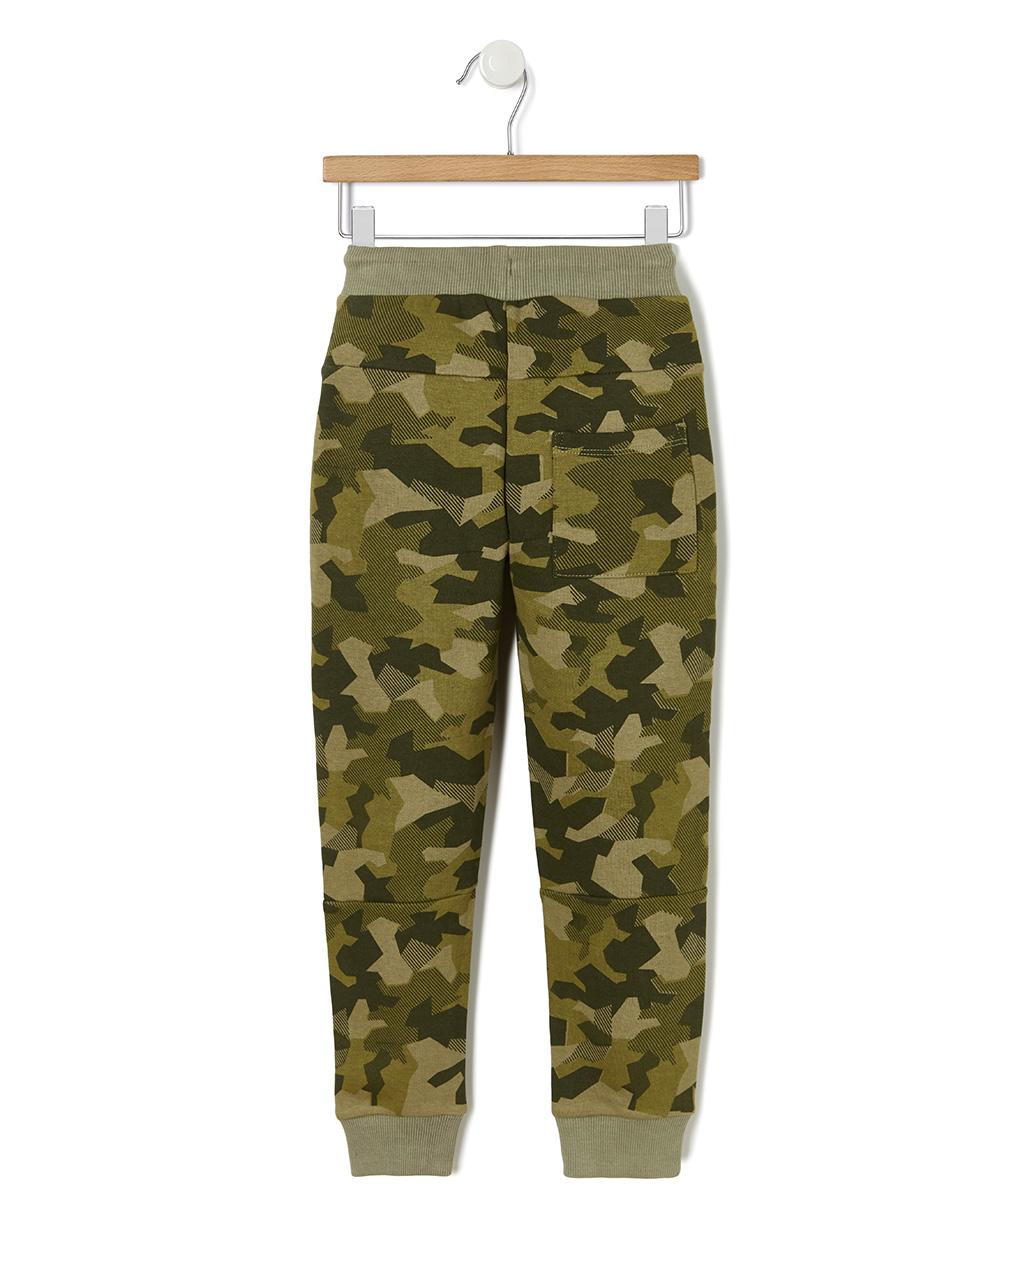 Pantaloni in felpa con fantasia camouflage - Prénatal